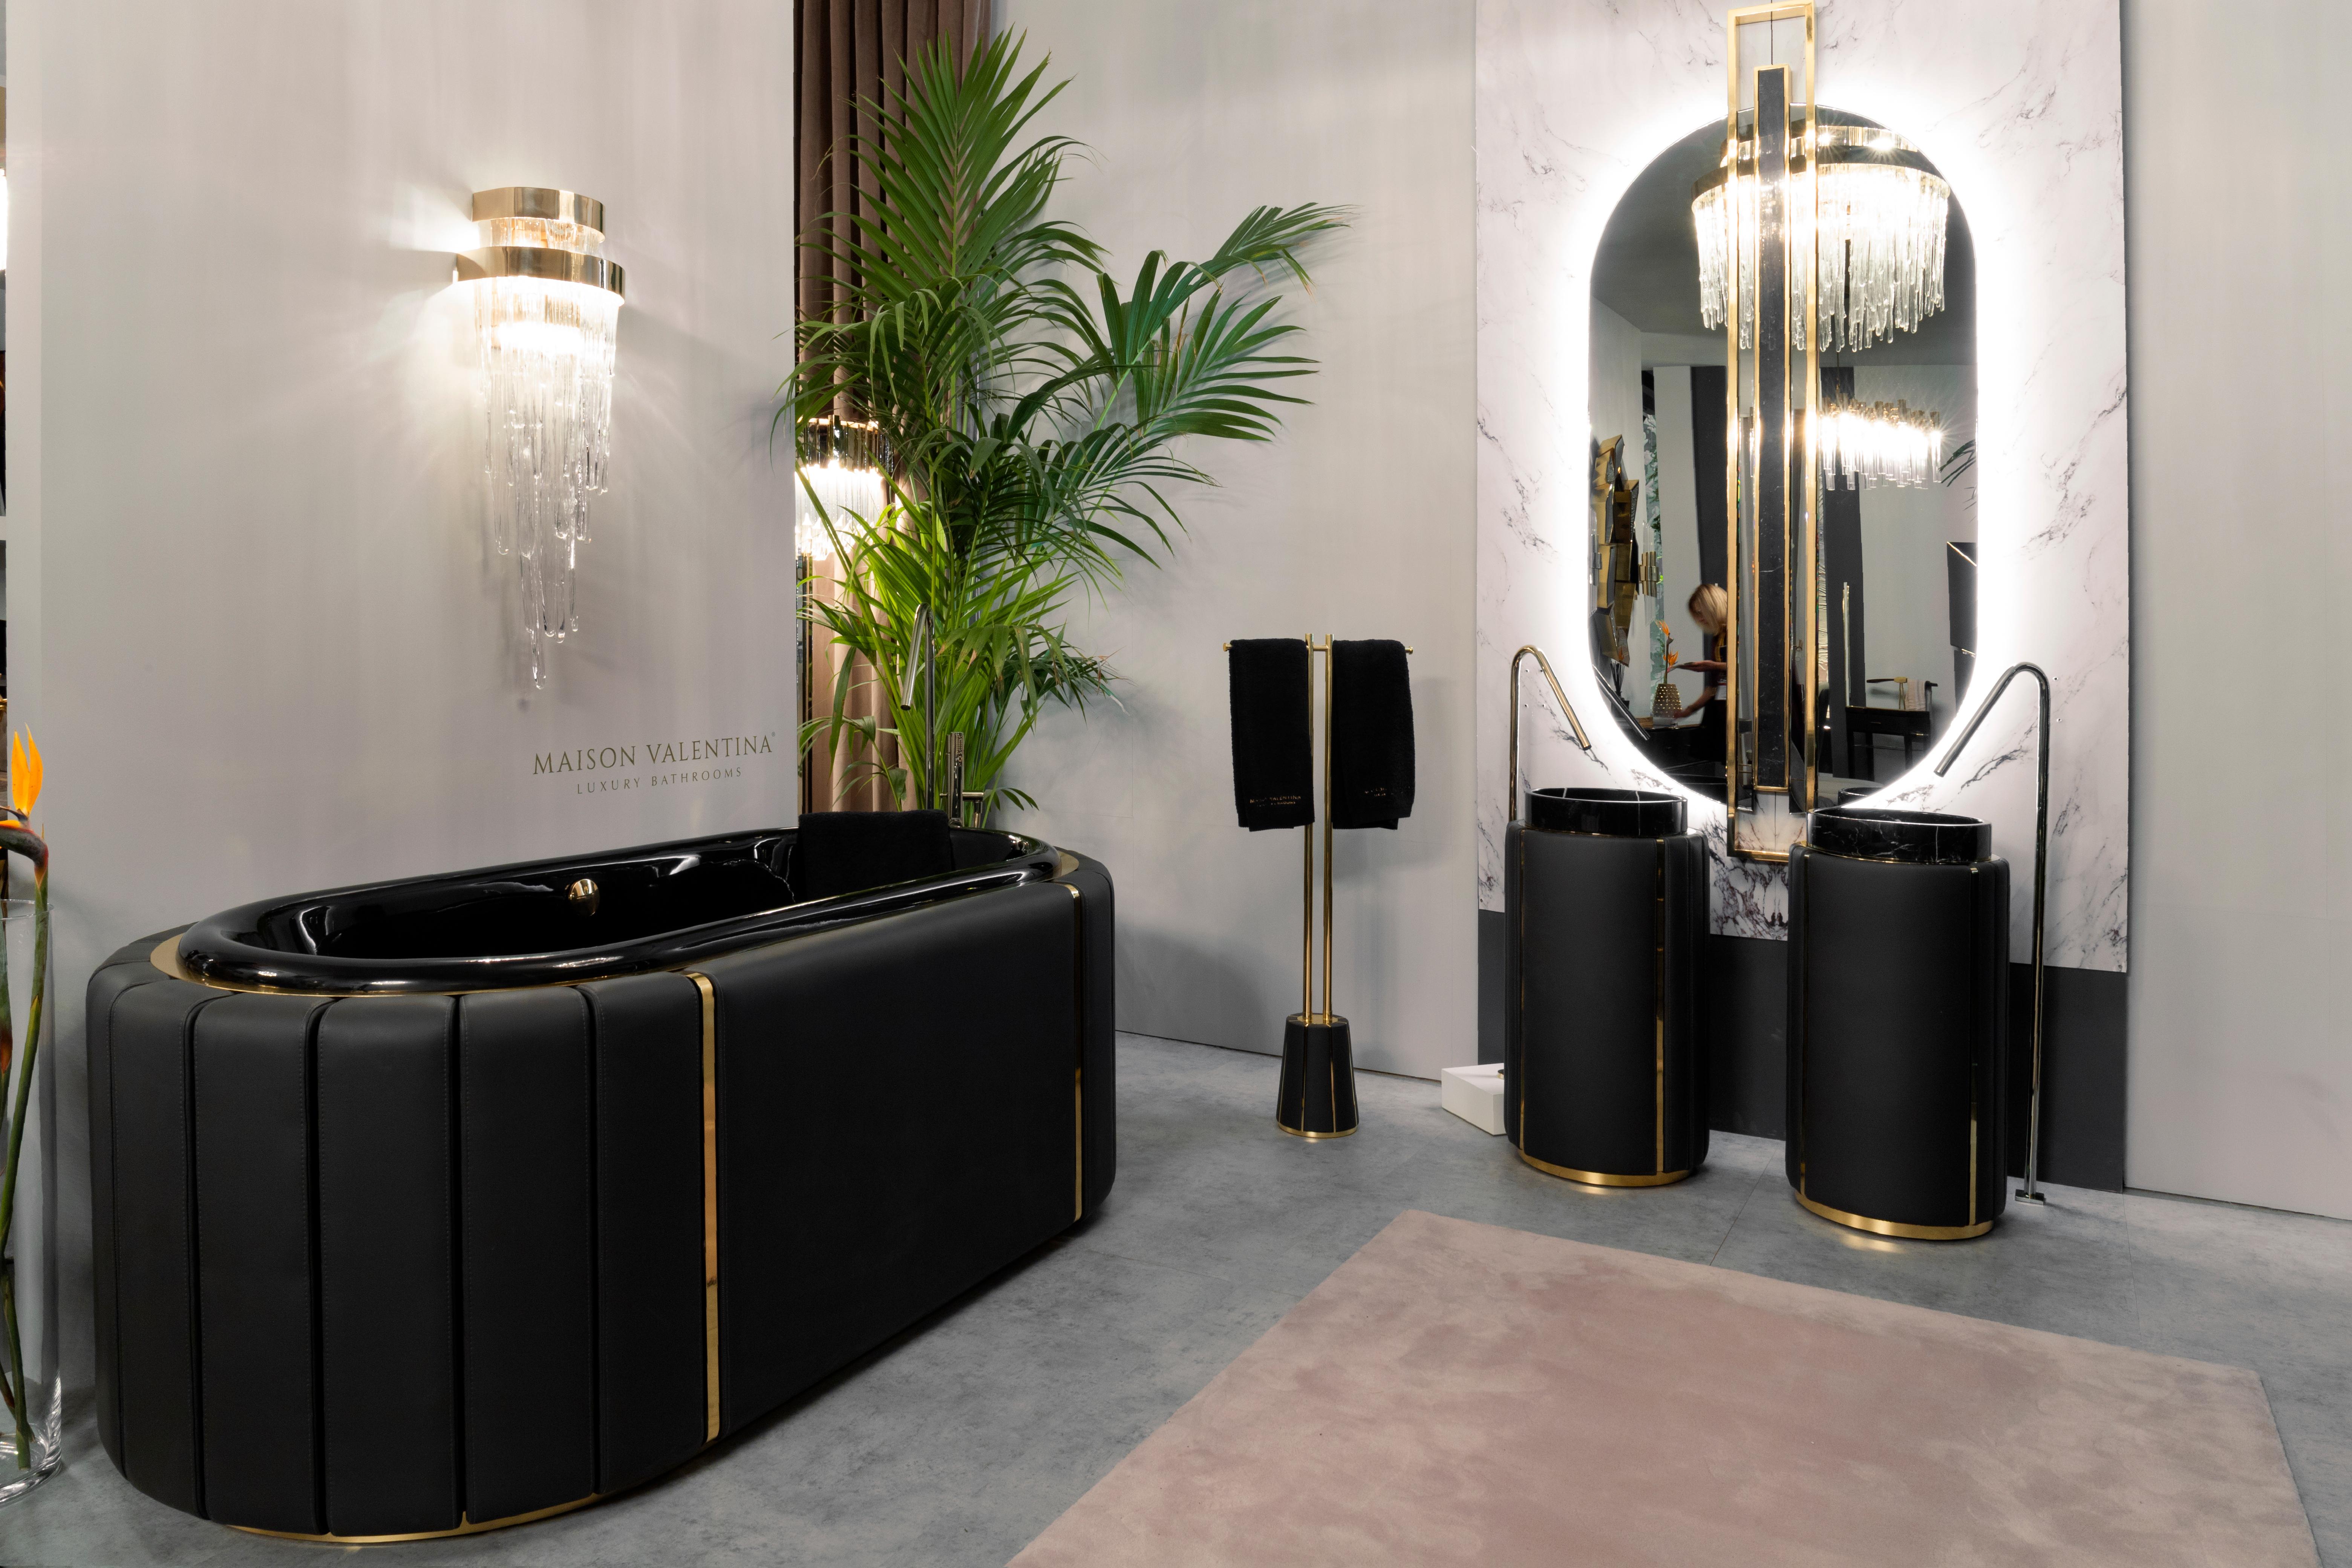 Darian Collection,bathtub, freestanding, bathroom, bathroom design, bathroom decor, leather darian collection Darian Collection – Daring Elegance and Sophistication to Your Bathroom Darian Bathtub